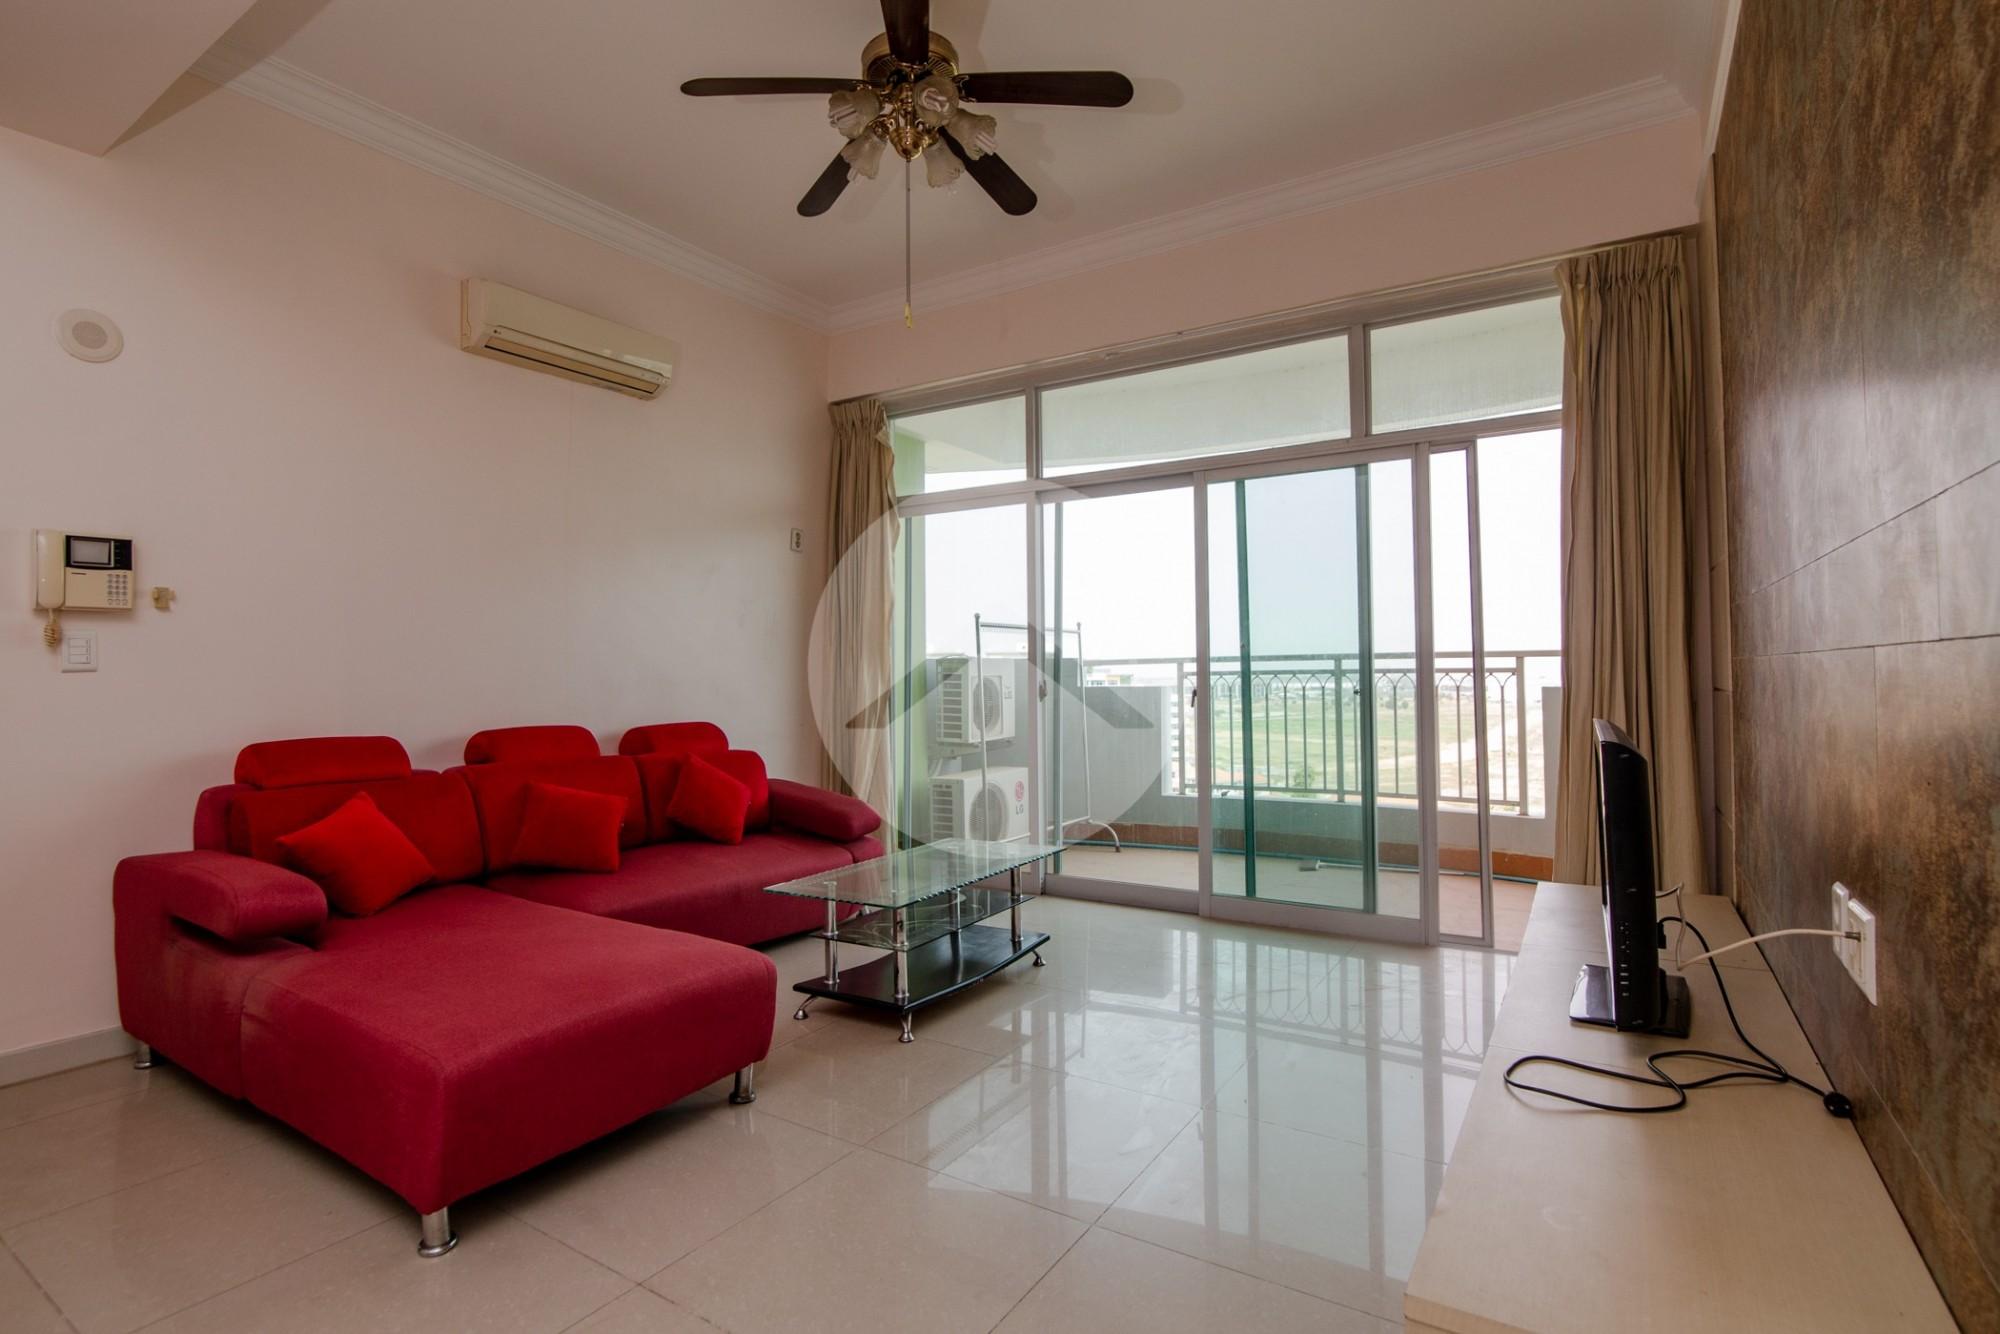 2 Bedroom Condo For Rent - Boeung Kak 1, Phnom Penh